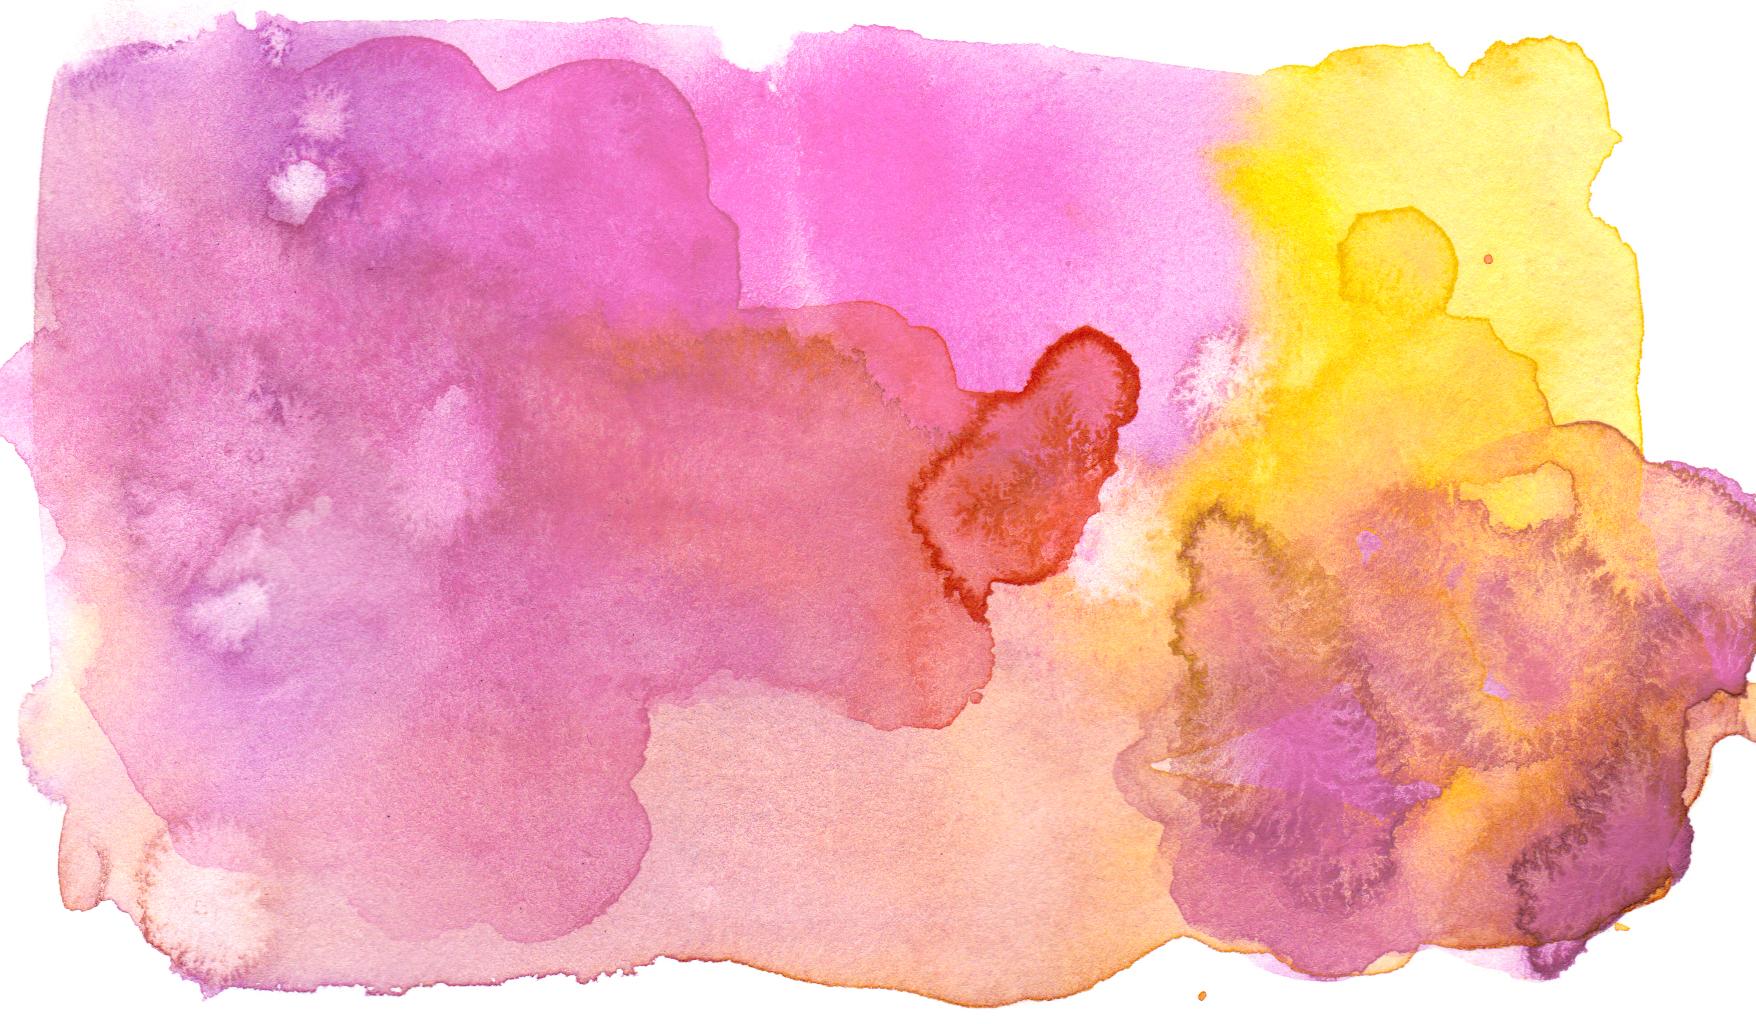 watercolor textures MGaber3.jpg